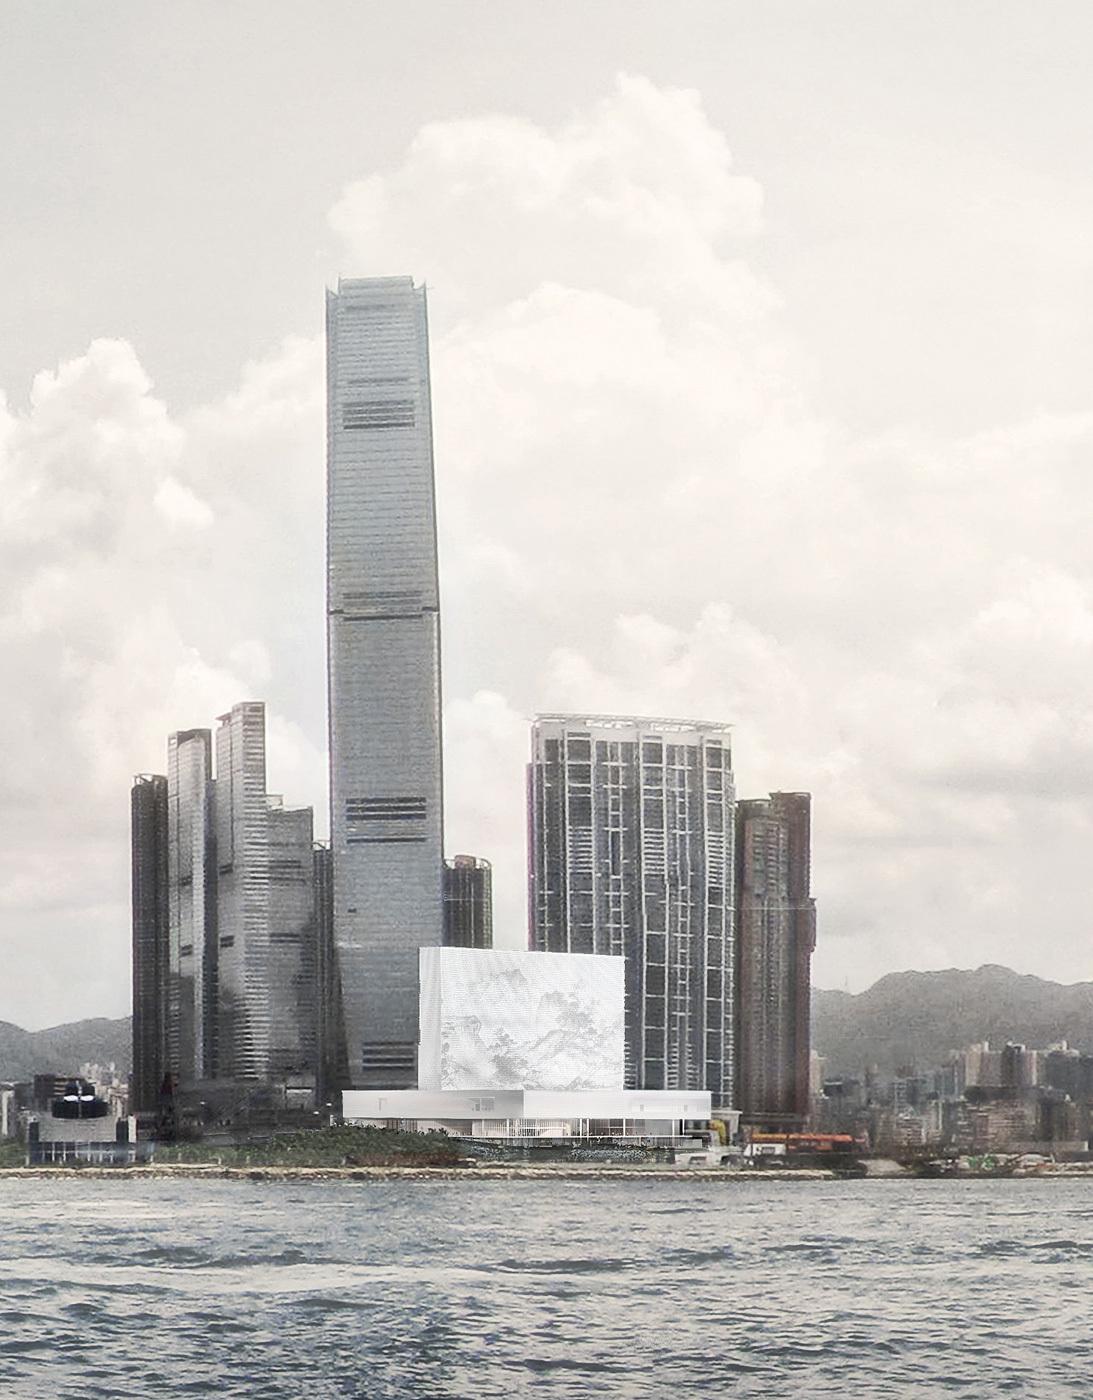 Day Scene: View of M+ from Hong Kong Island © Herzog & de Meuron, Courtesy of Herzog & de Meuron and WKCDA